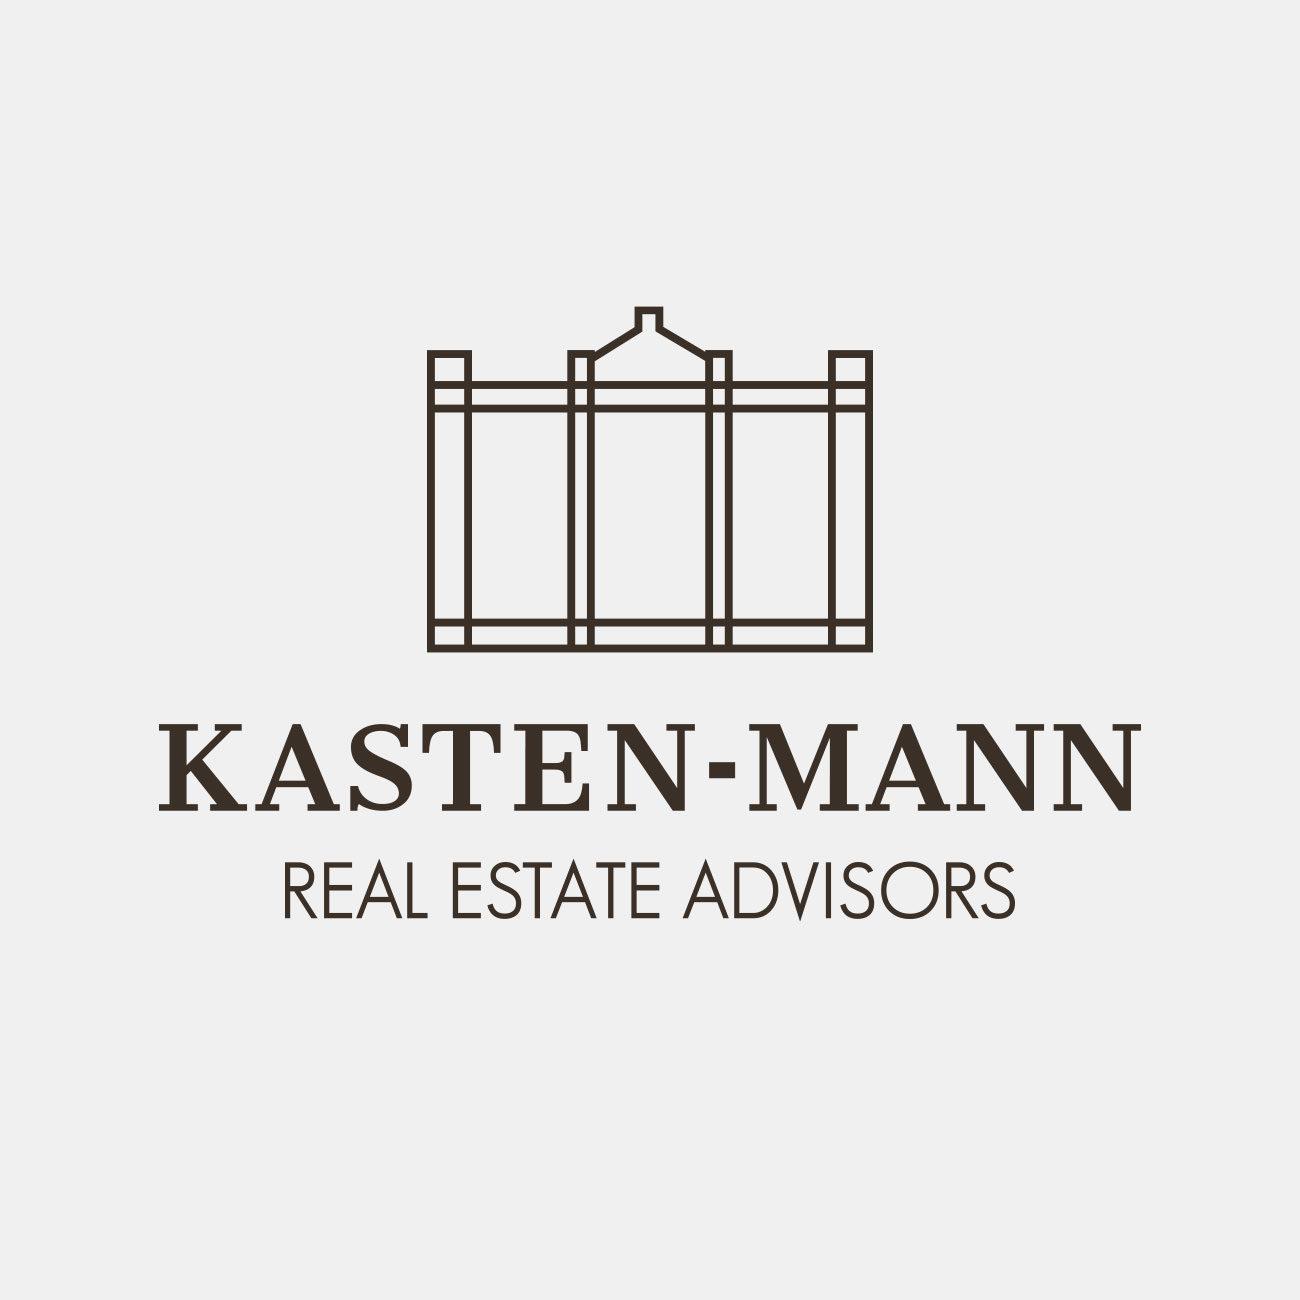 Lasten-Mann Logodesign